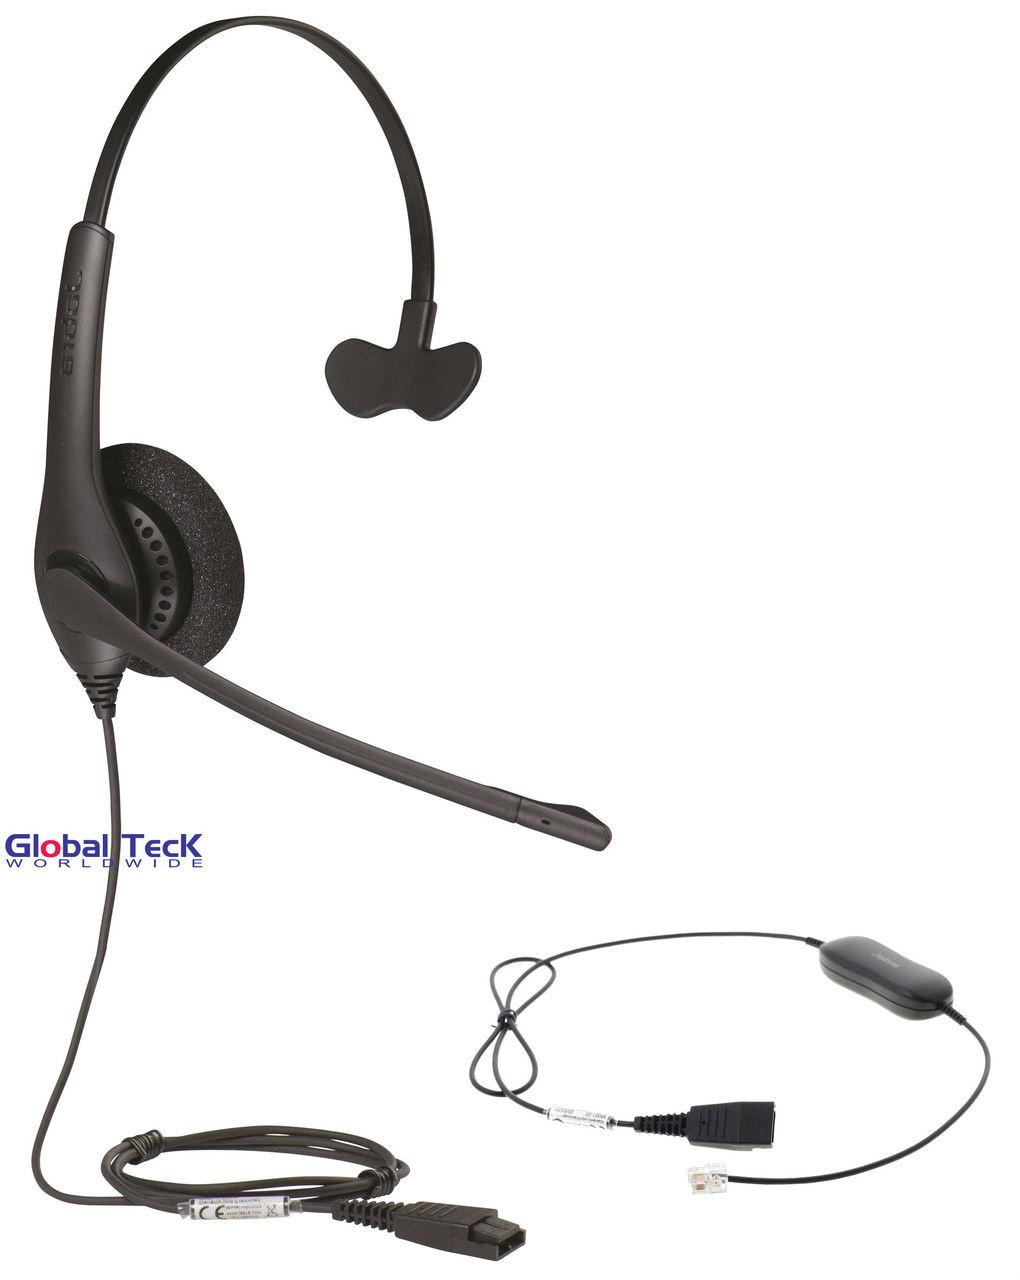 Avaya Phone Compatible 1520 Direct Connect Headset | Avaya IP Phones: 1608,  1616, 9601, 9608, 9610, 9611, 9611G, 9620, 9620C, 9620L, 9621, 9630, 9640,